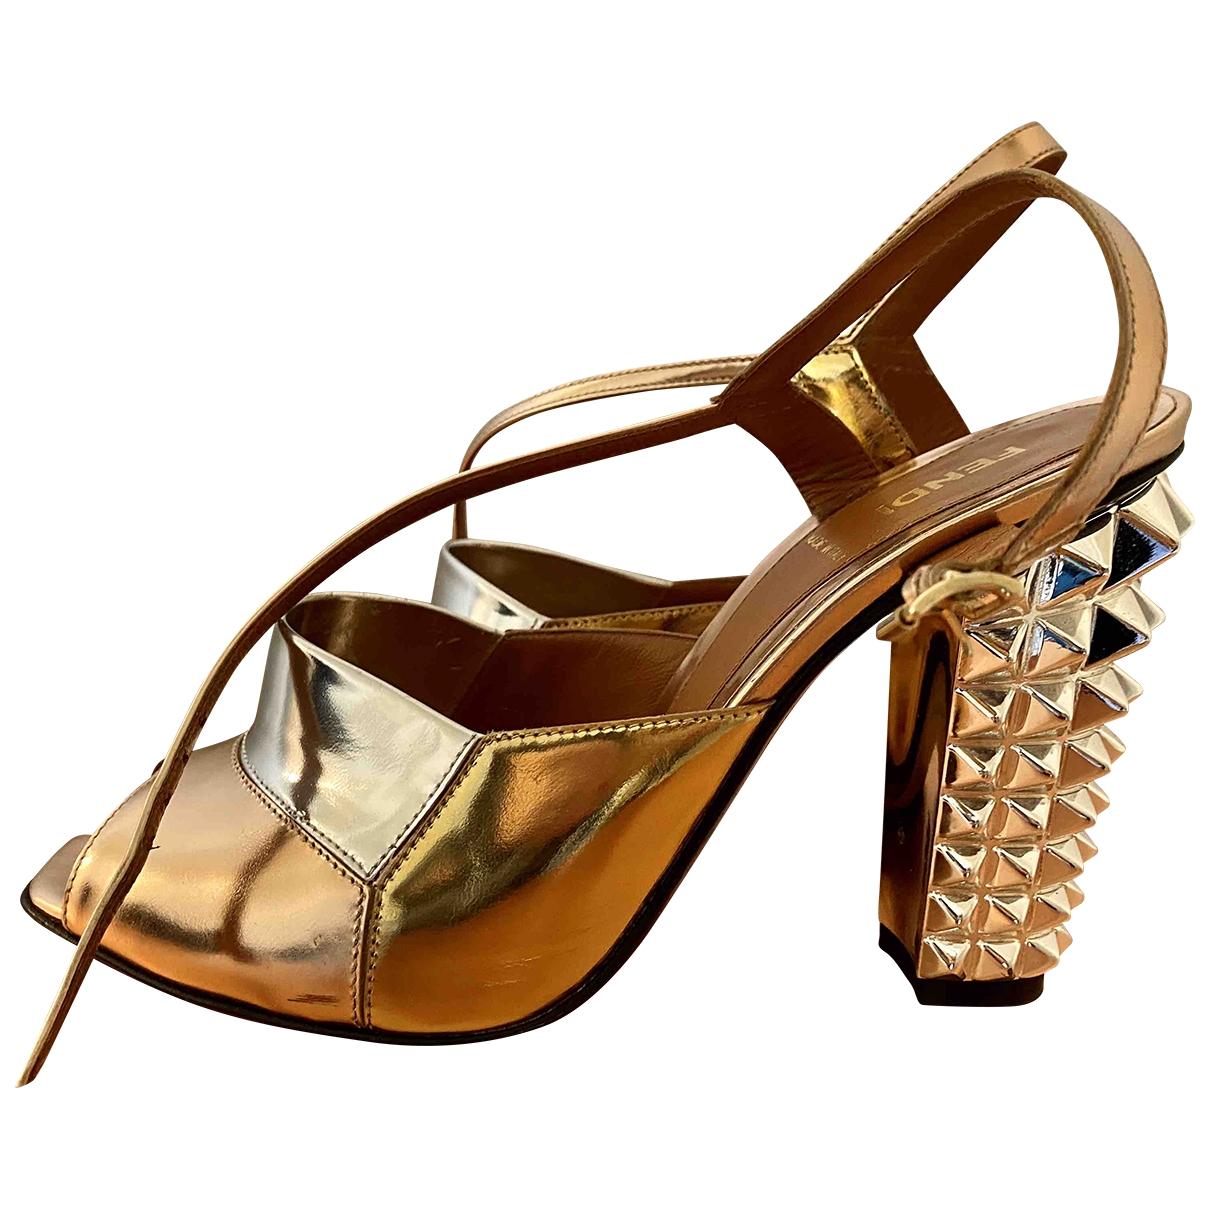 Fendi \N Metallic Leather Sandals for Women 39 EU